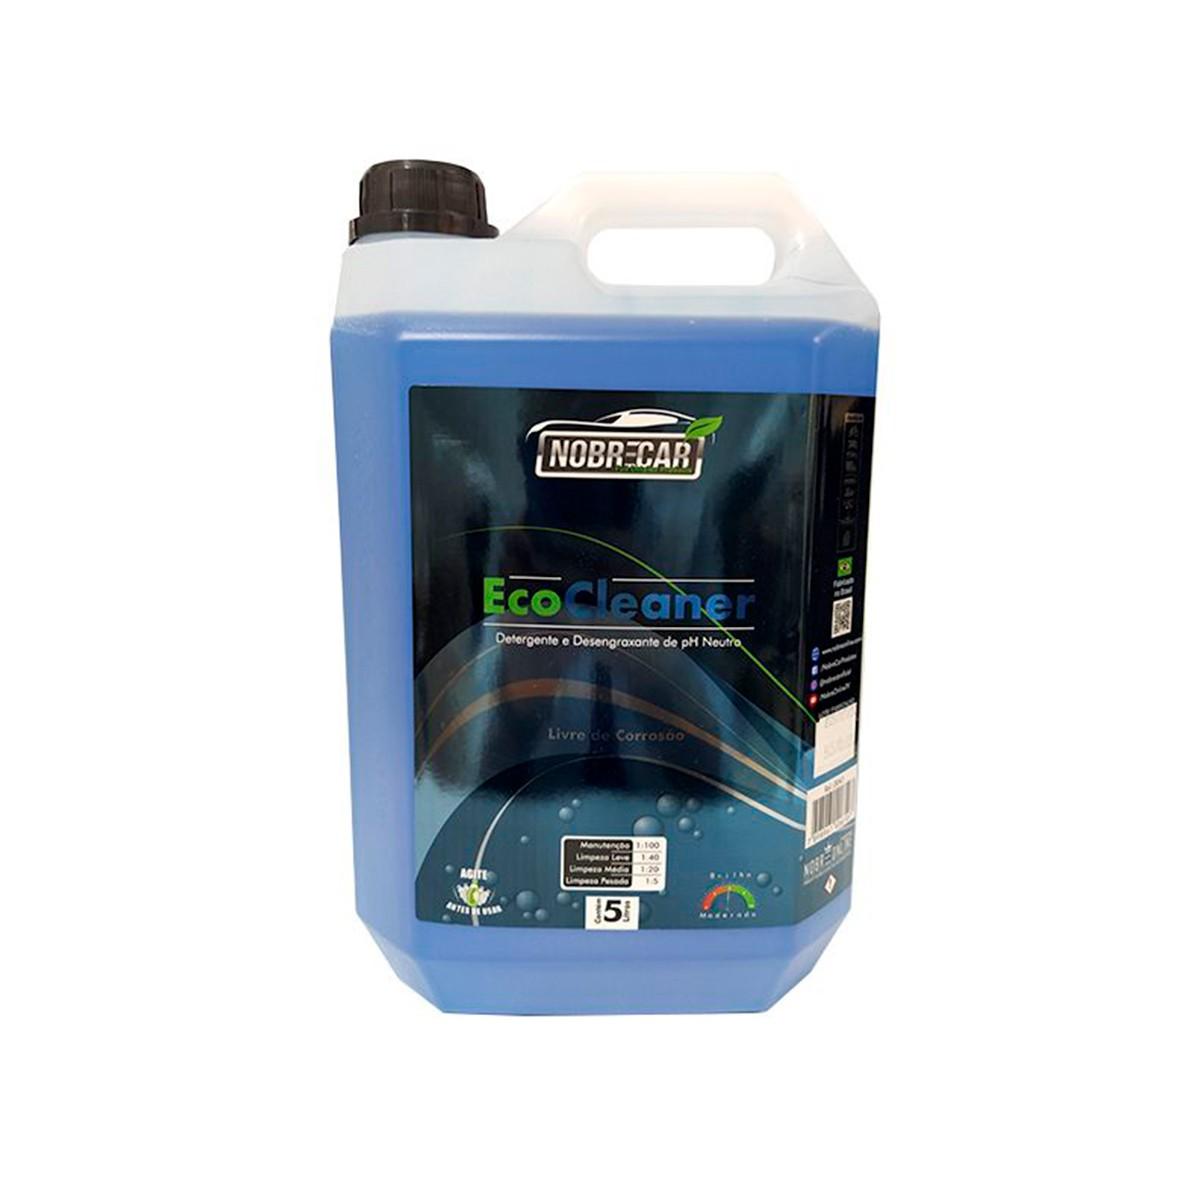 Eco Cleaner - Detergente e Desengraxante de pH Neutro - Nobrecar